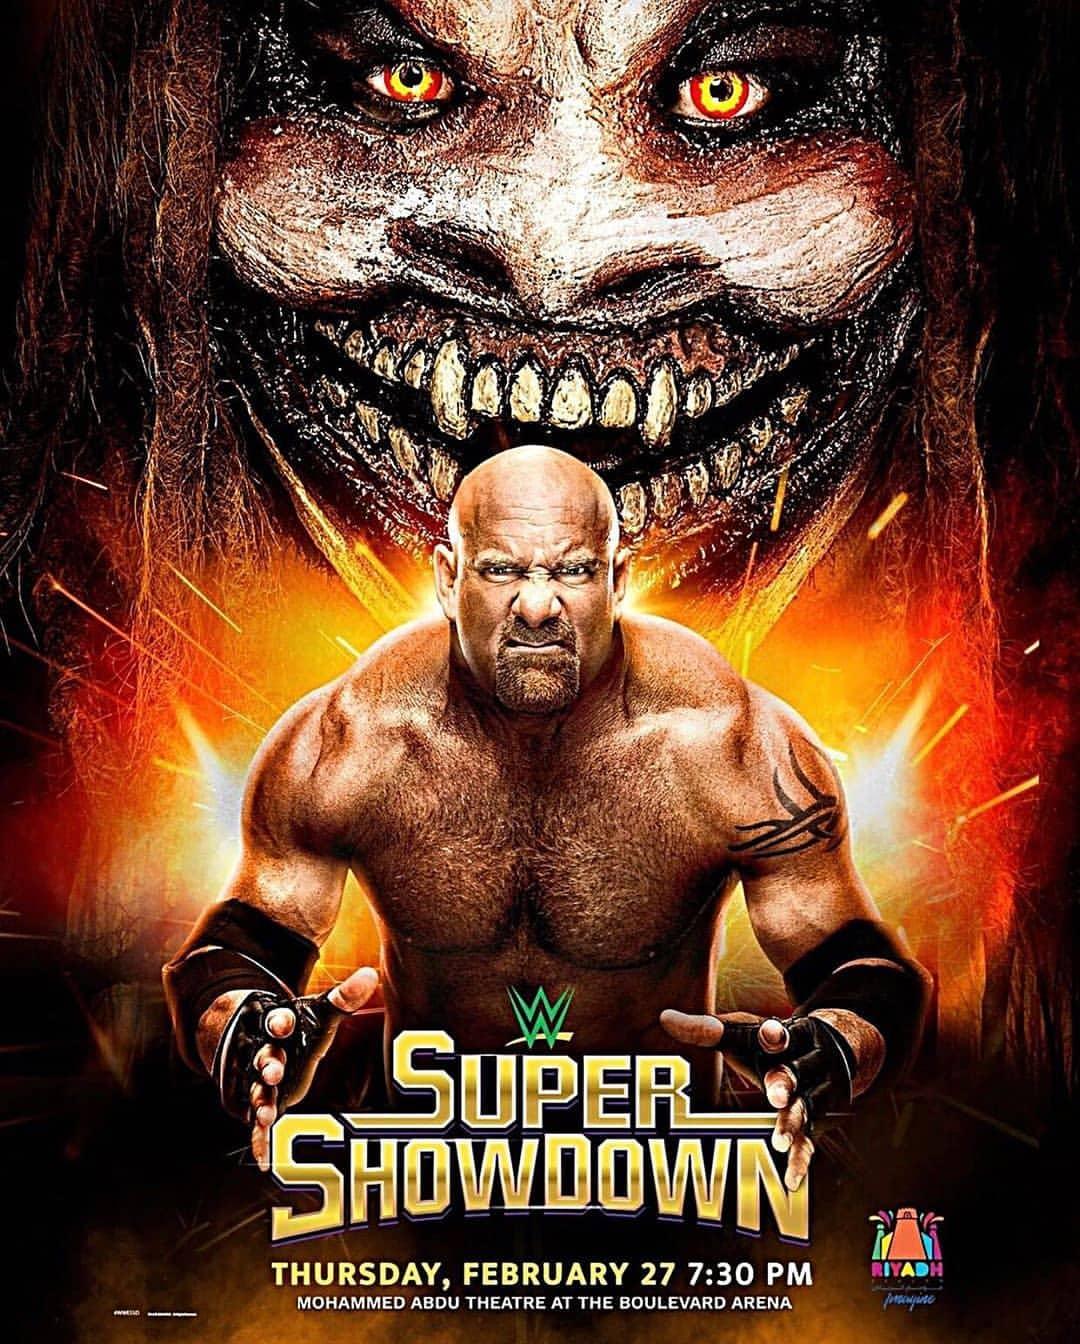 WWE Super ShowDown 2020 Official Poster - Goldberg vs The Fiend Bray Wyatt